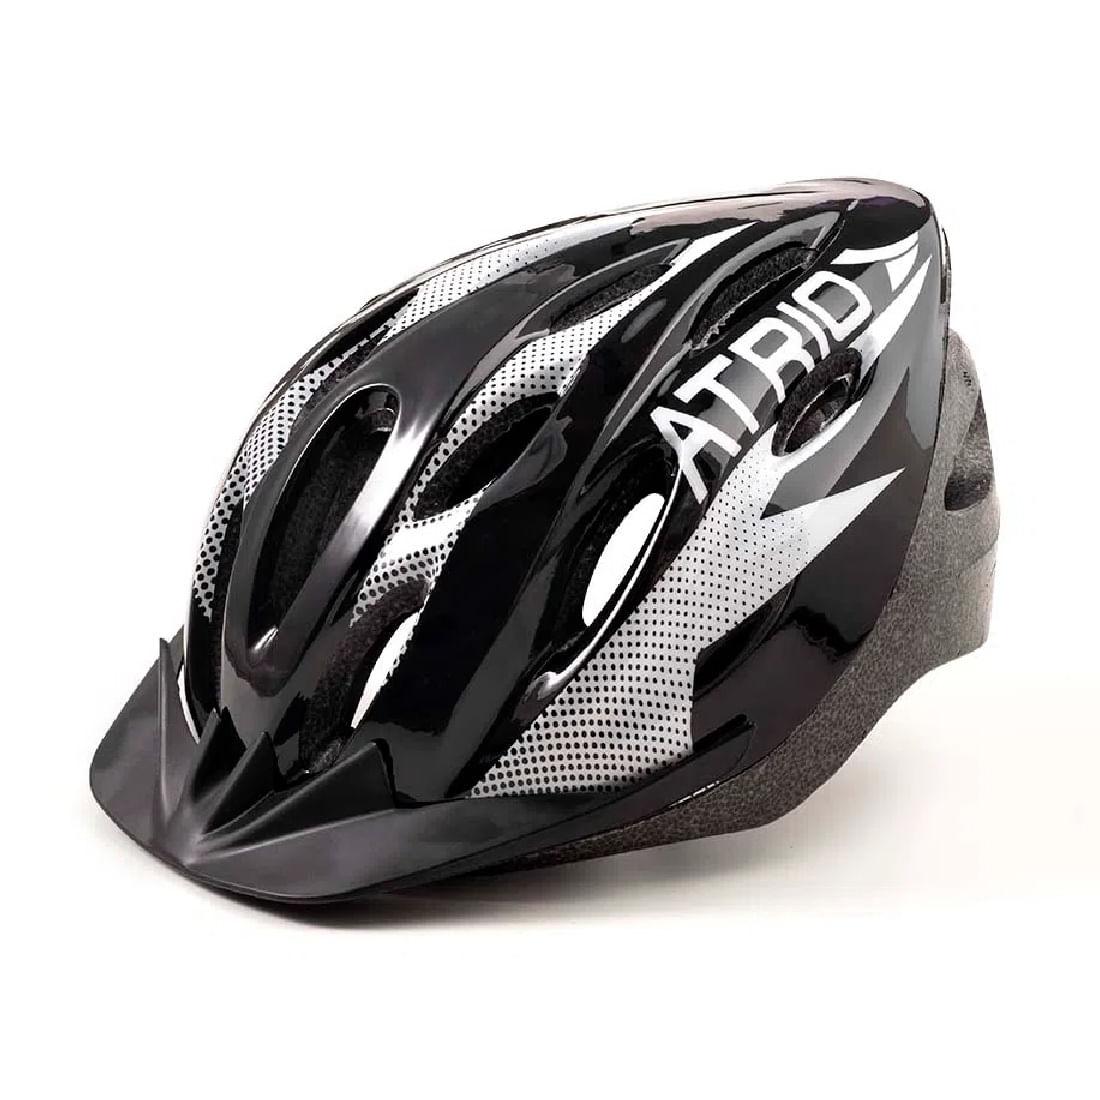 Capacete-de-Bike-MTB-2.0-Atrio-BI158-Preto-com-Branco-e-Viseira---9766--1-